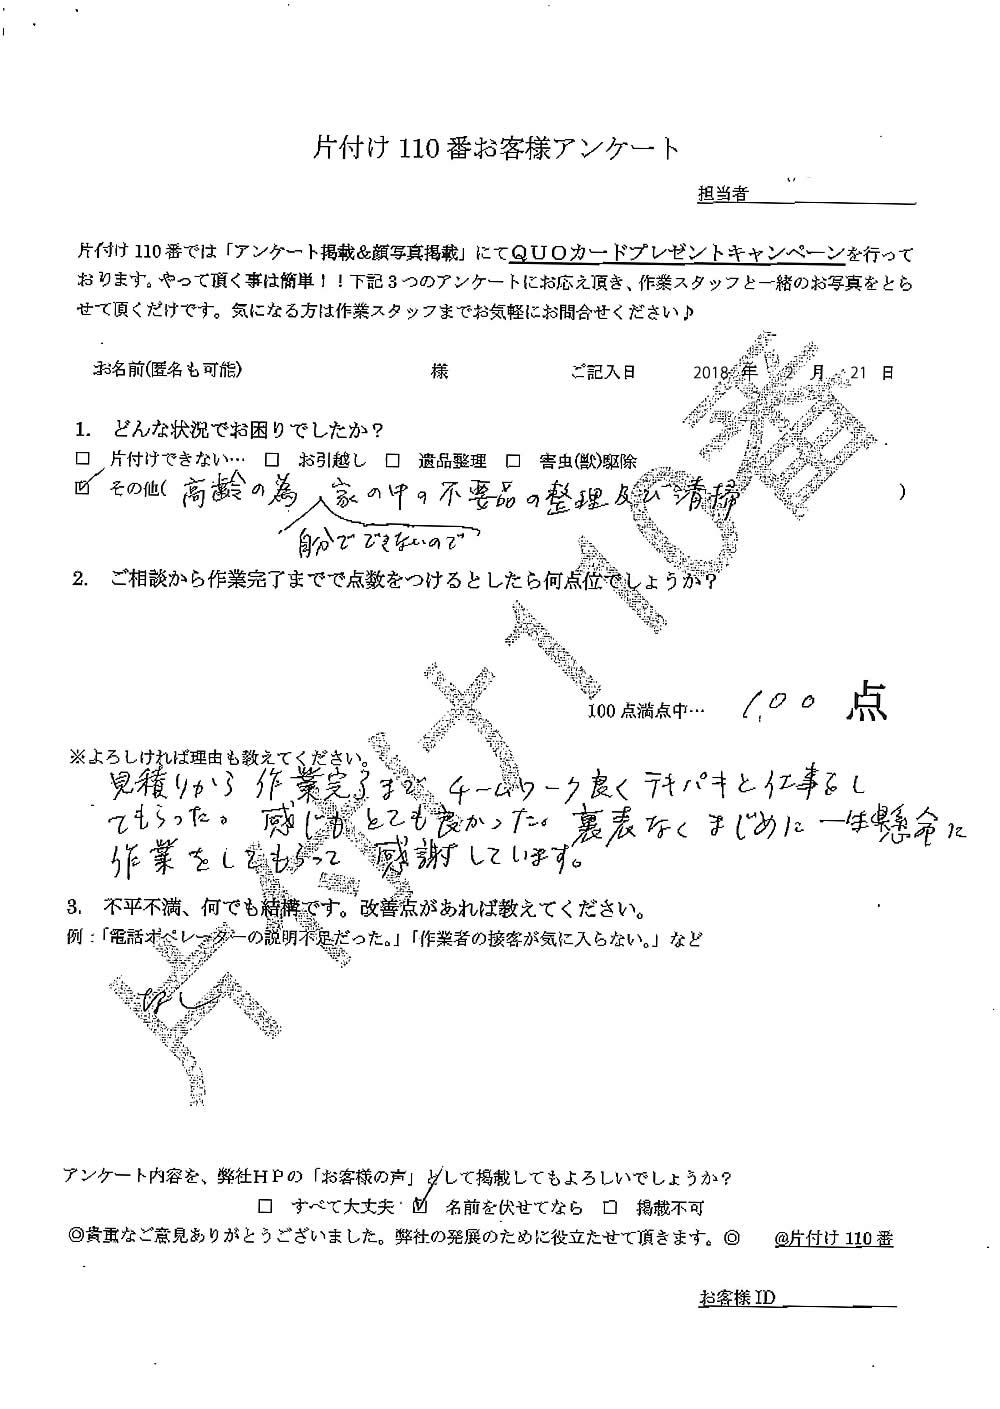 【宜野湾市】不用品回収及び簡易清掃のご依頼